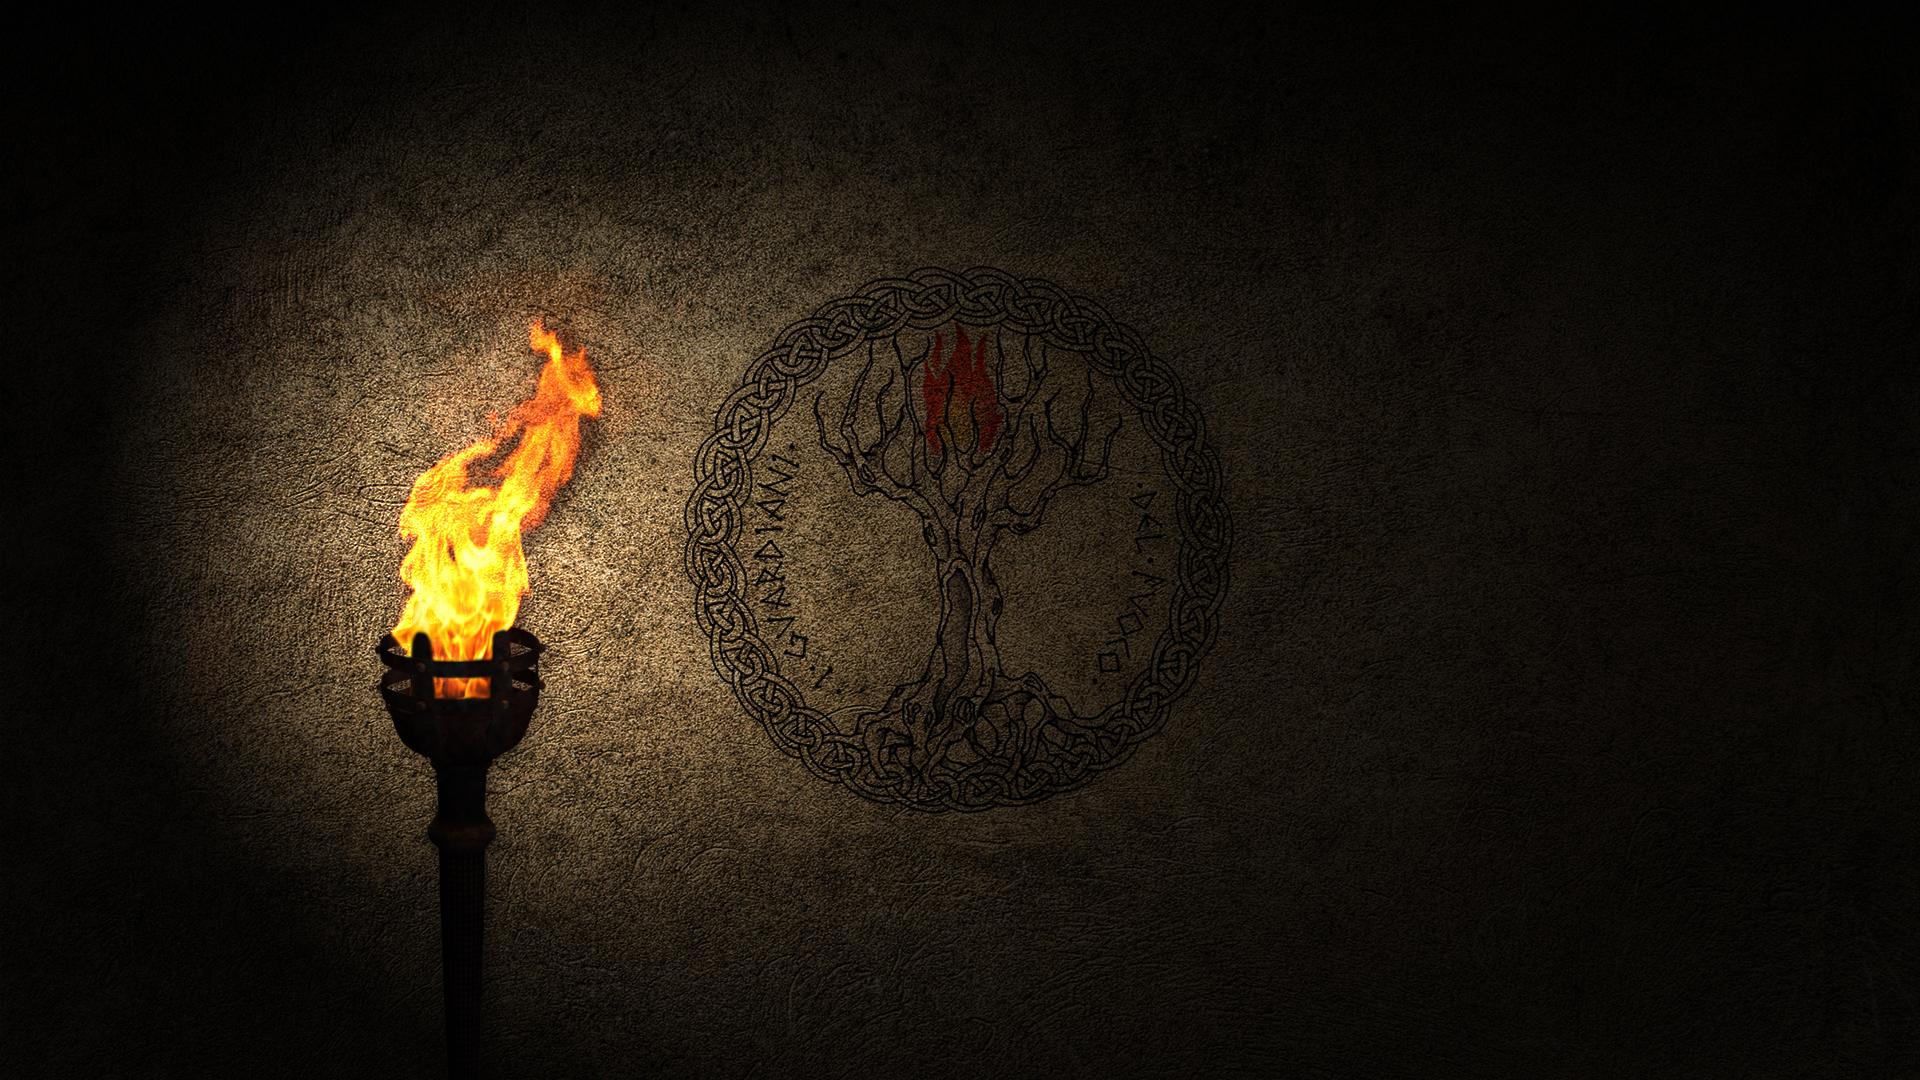 Guardians of fire Wallpaper